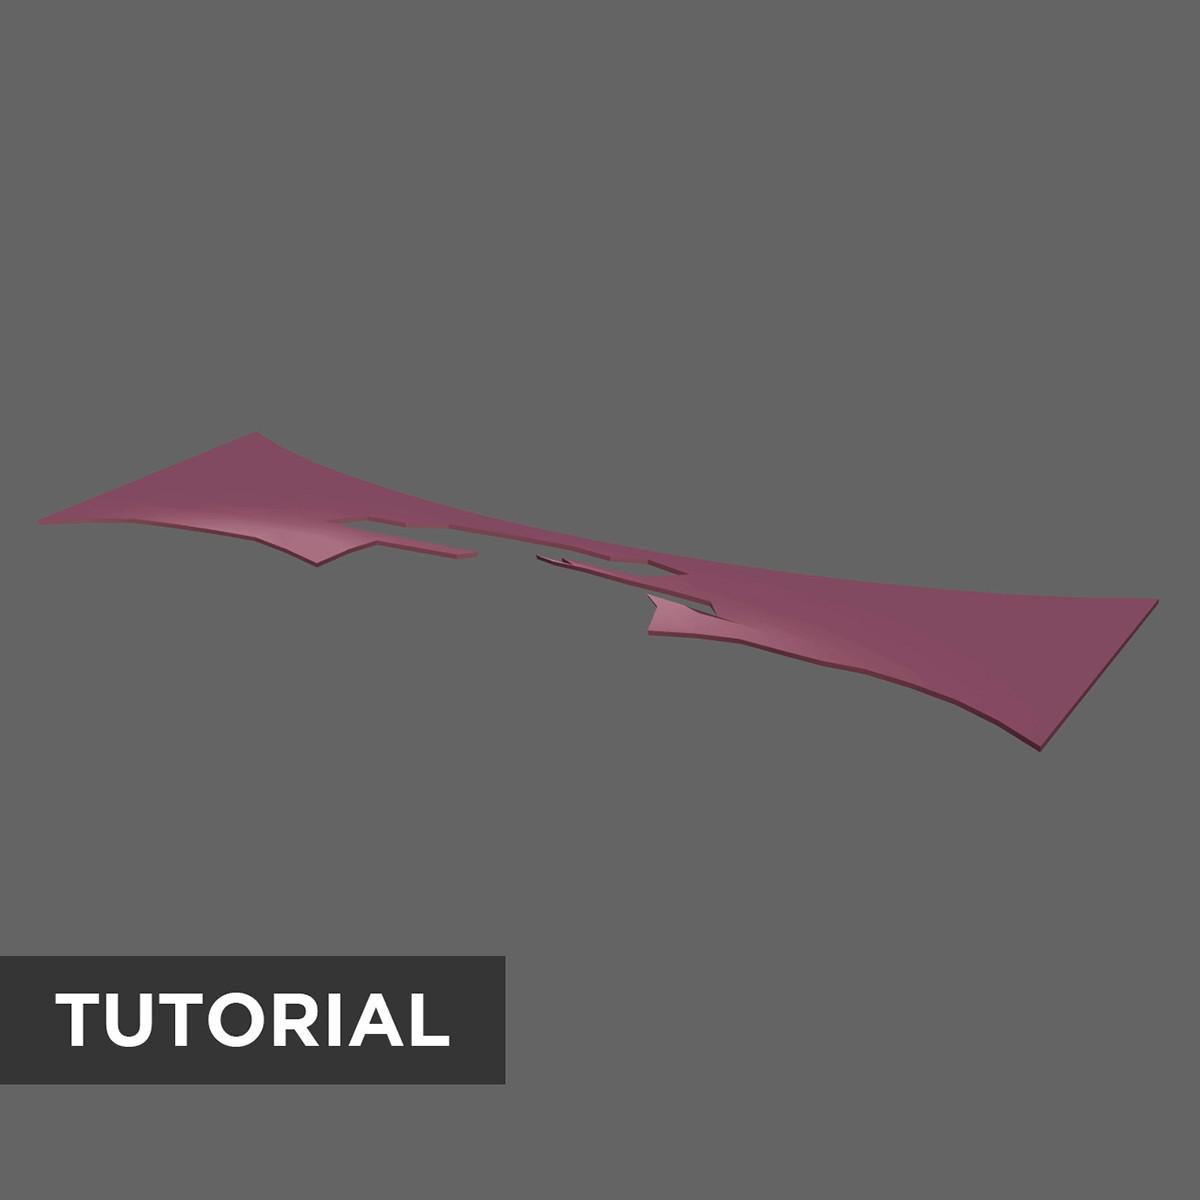 b3d,blender3d,tutorial,cloth